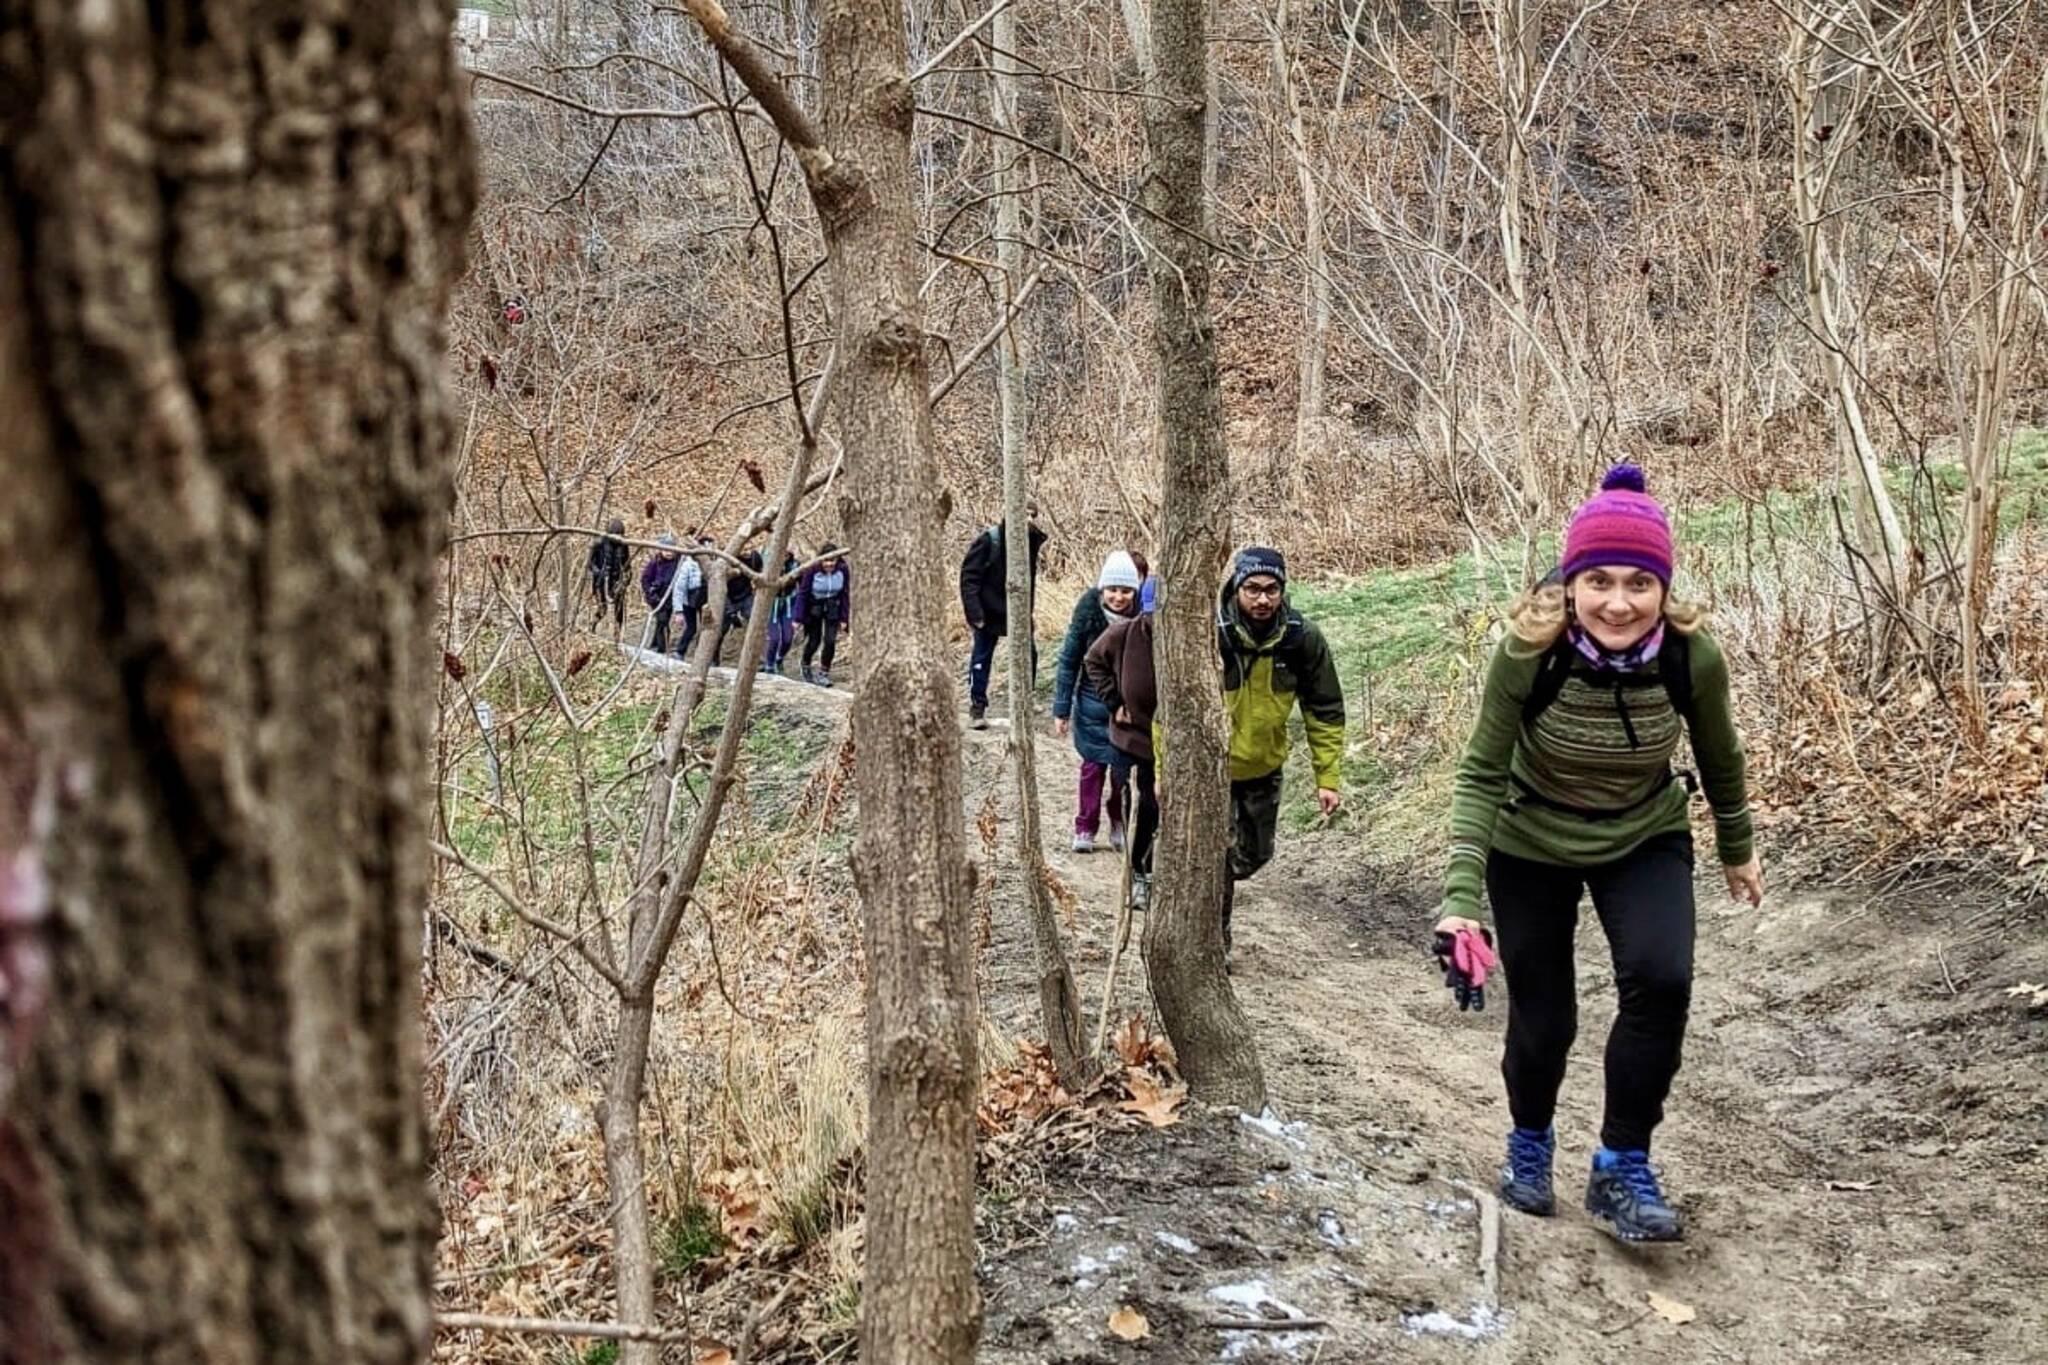 outdoor cadio ravine explorers